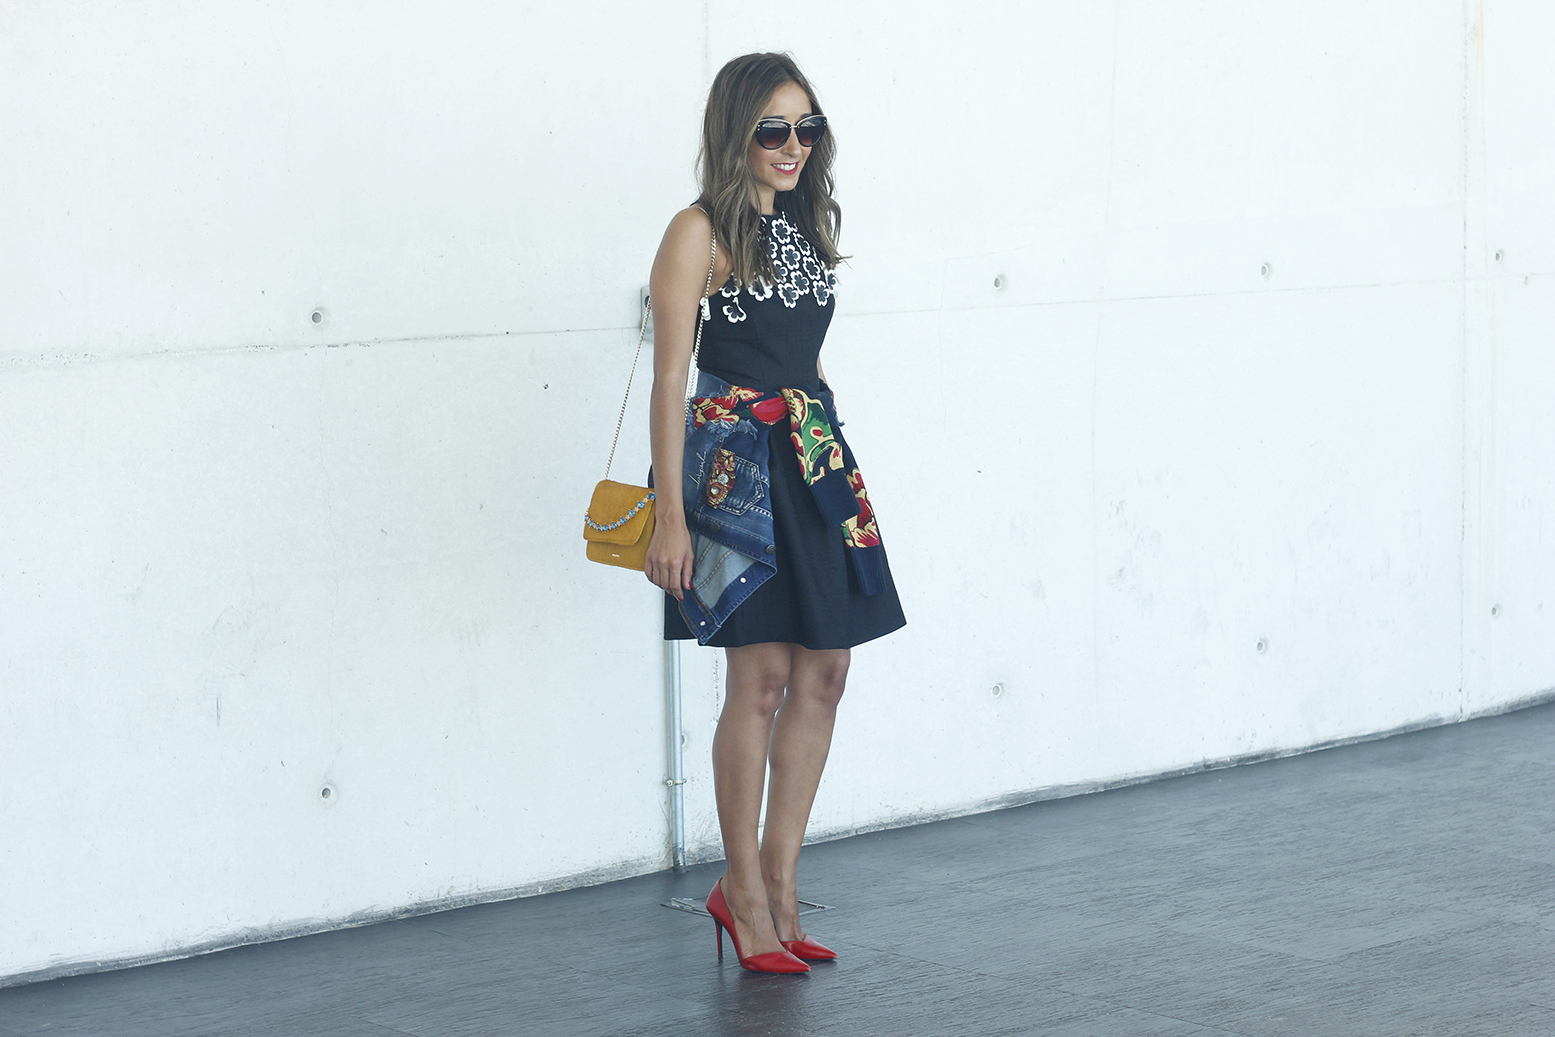 desigual black dress and denim jacket for fashion week madrid outfit fashion05